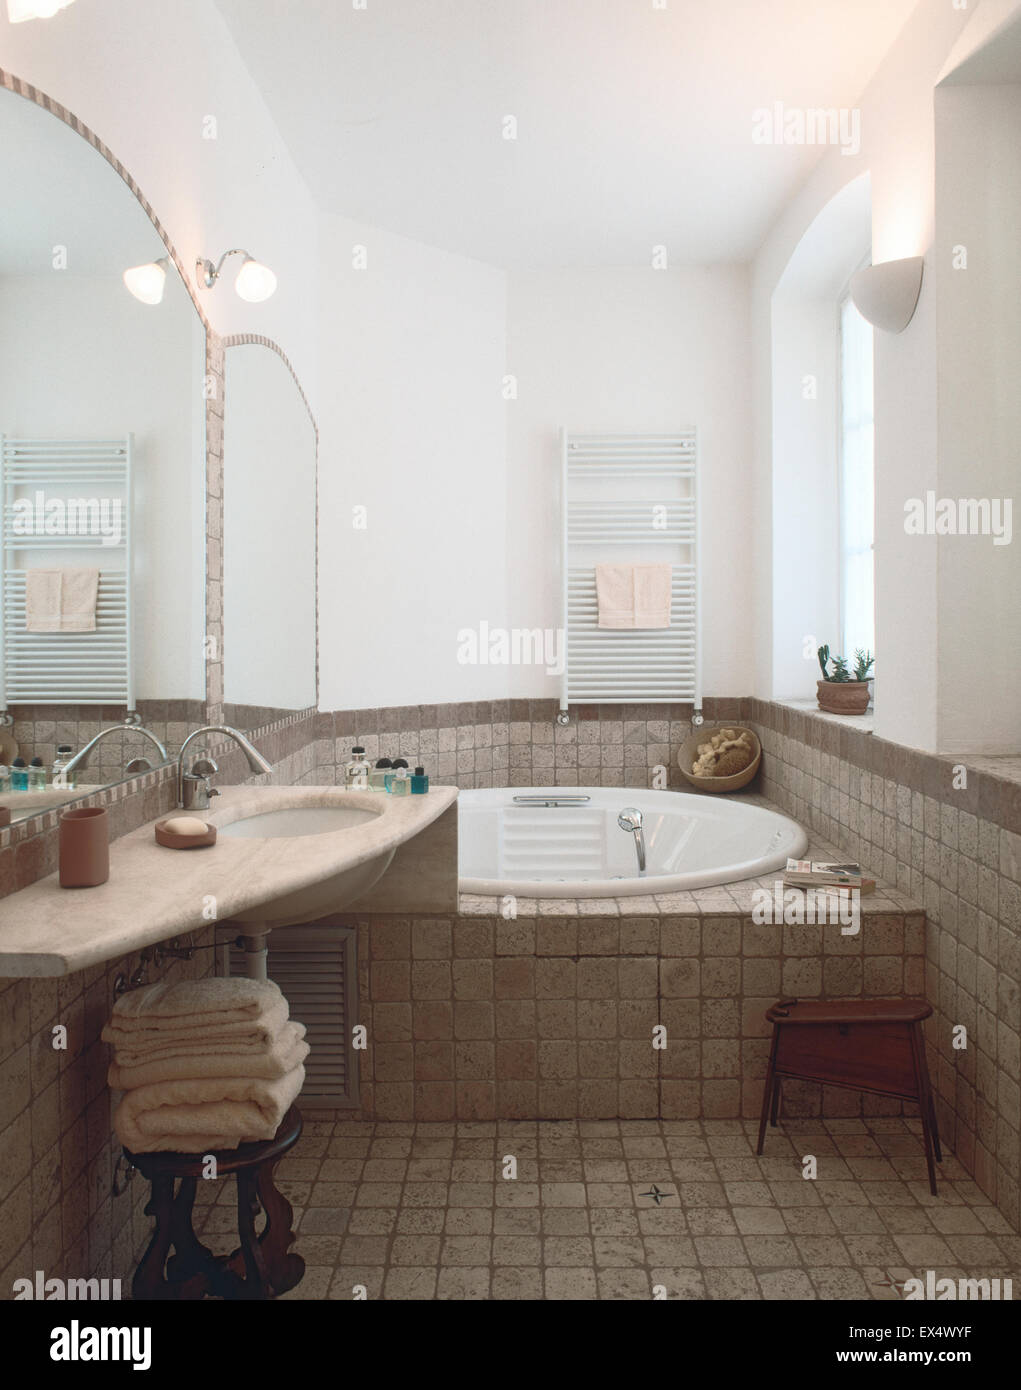 interior view of classic bathroom with tile floor overlooking on bathtub - Stock Image